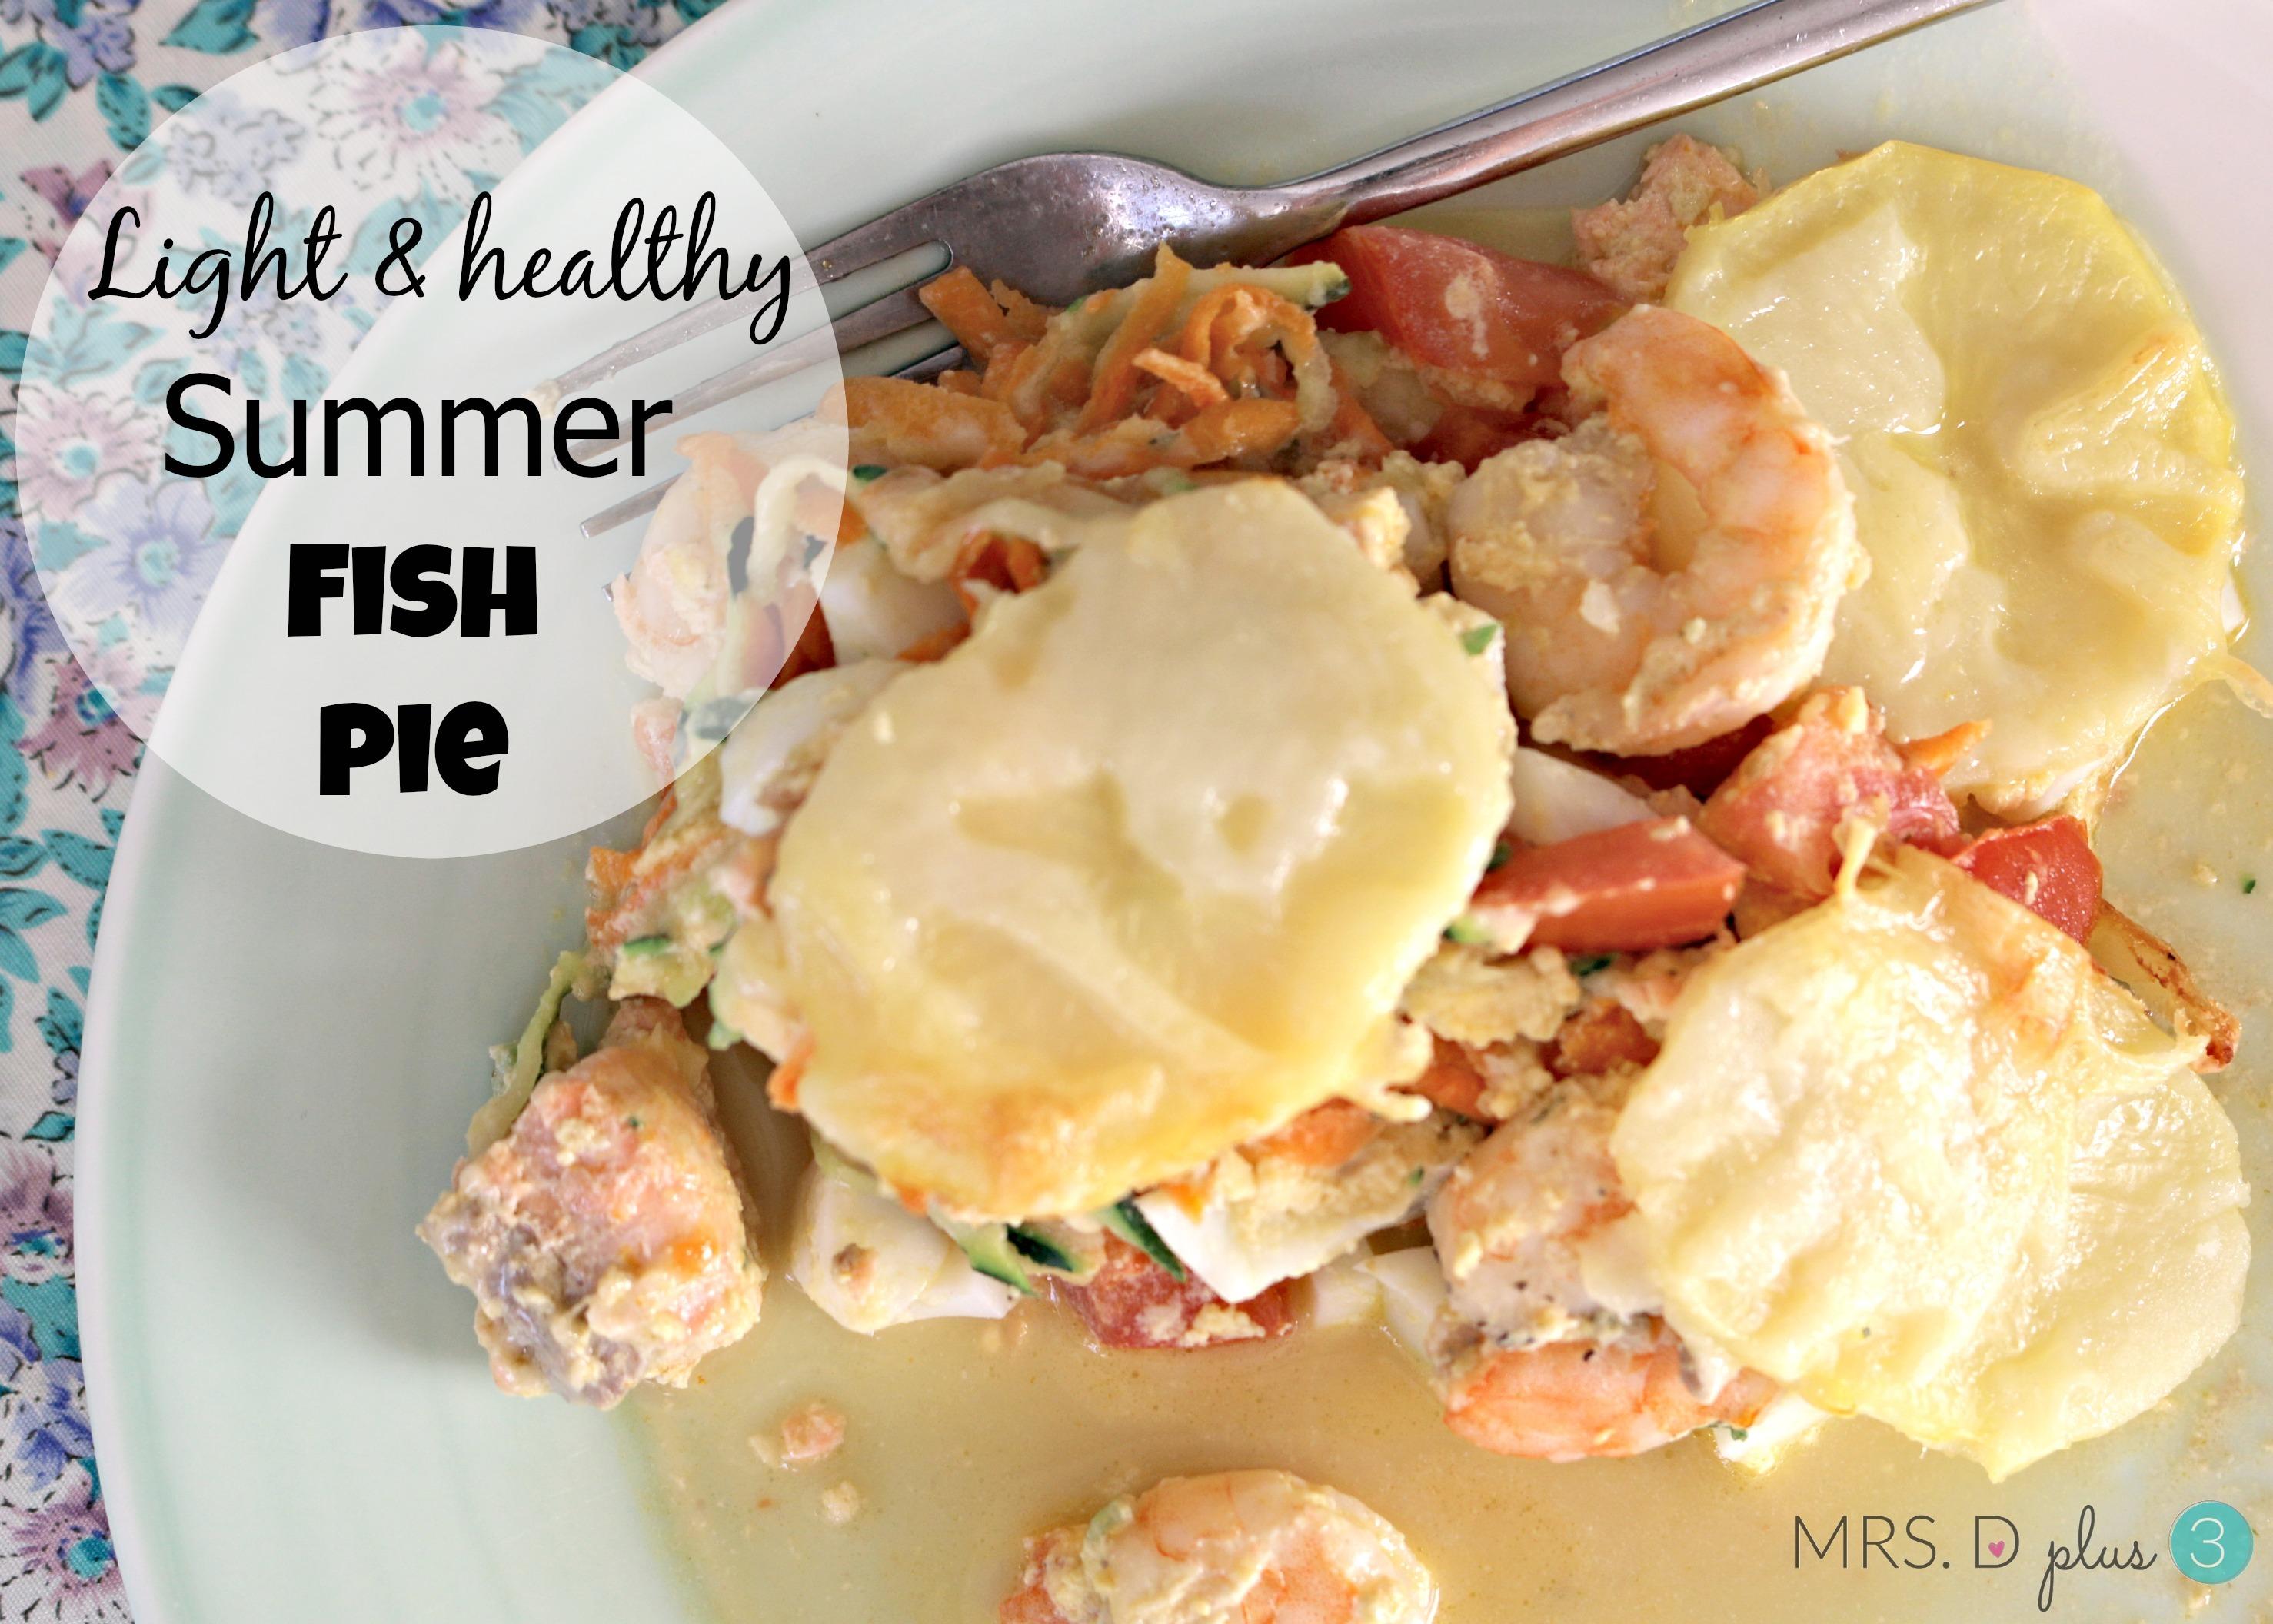 Jamie Oliver's Light & healthy 'summer' fish pie